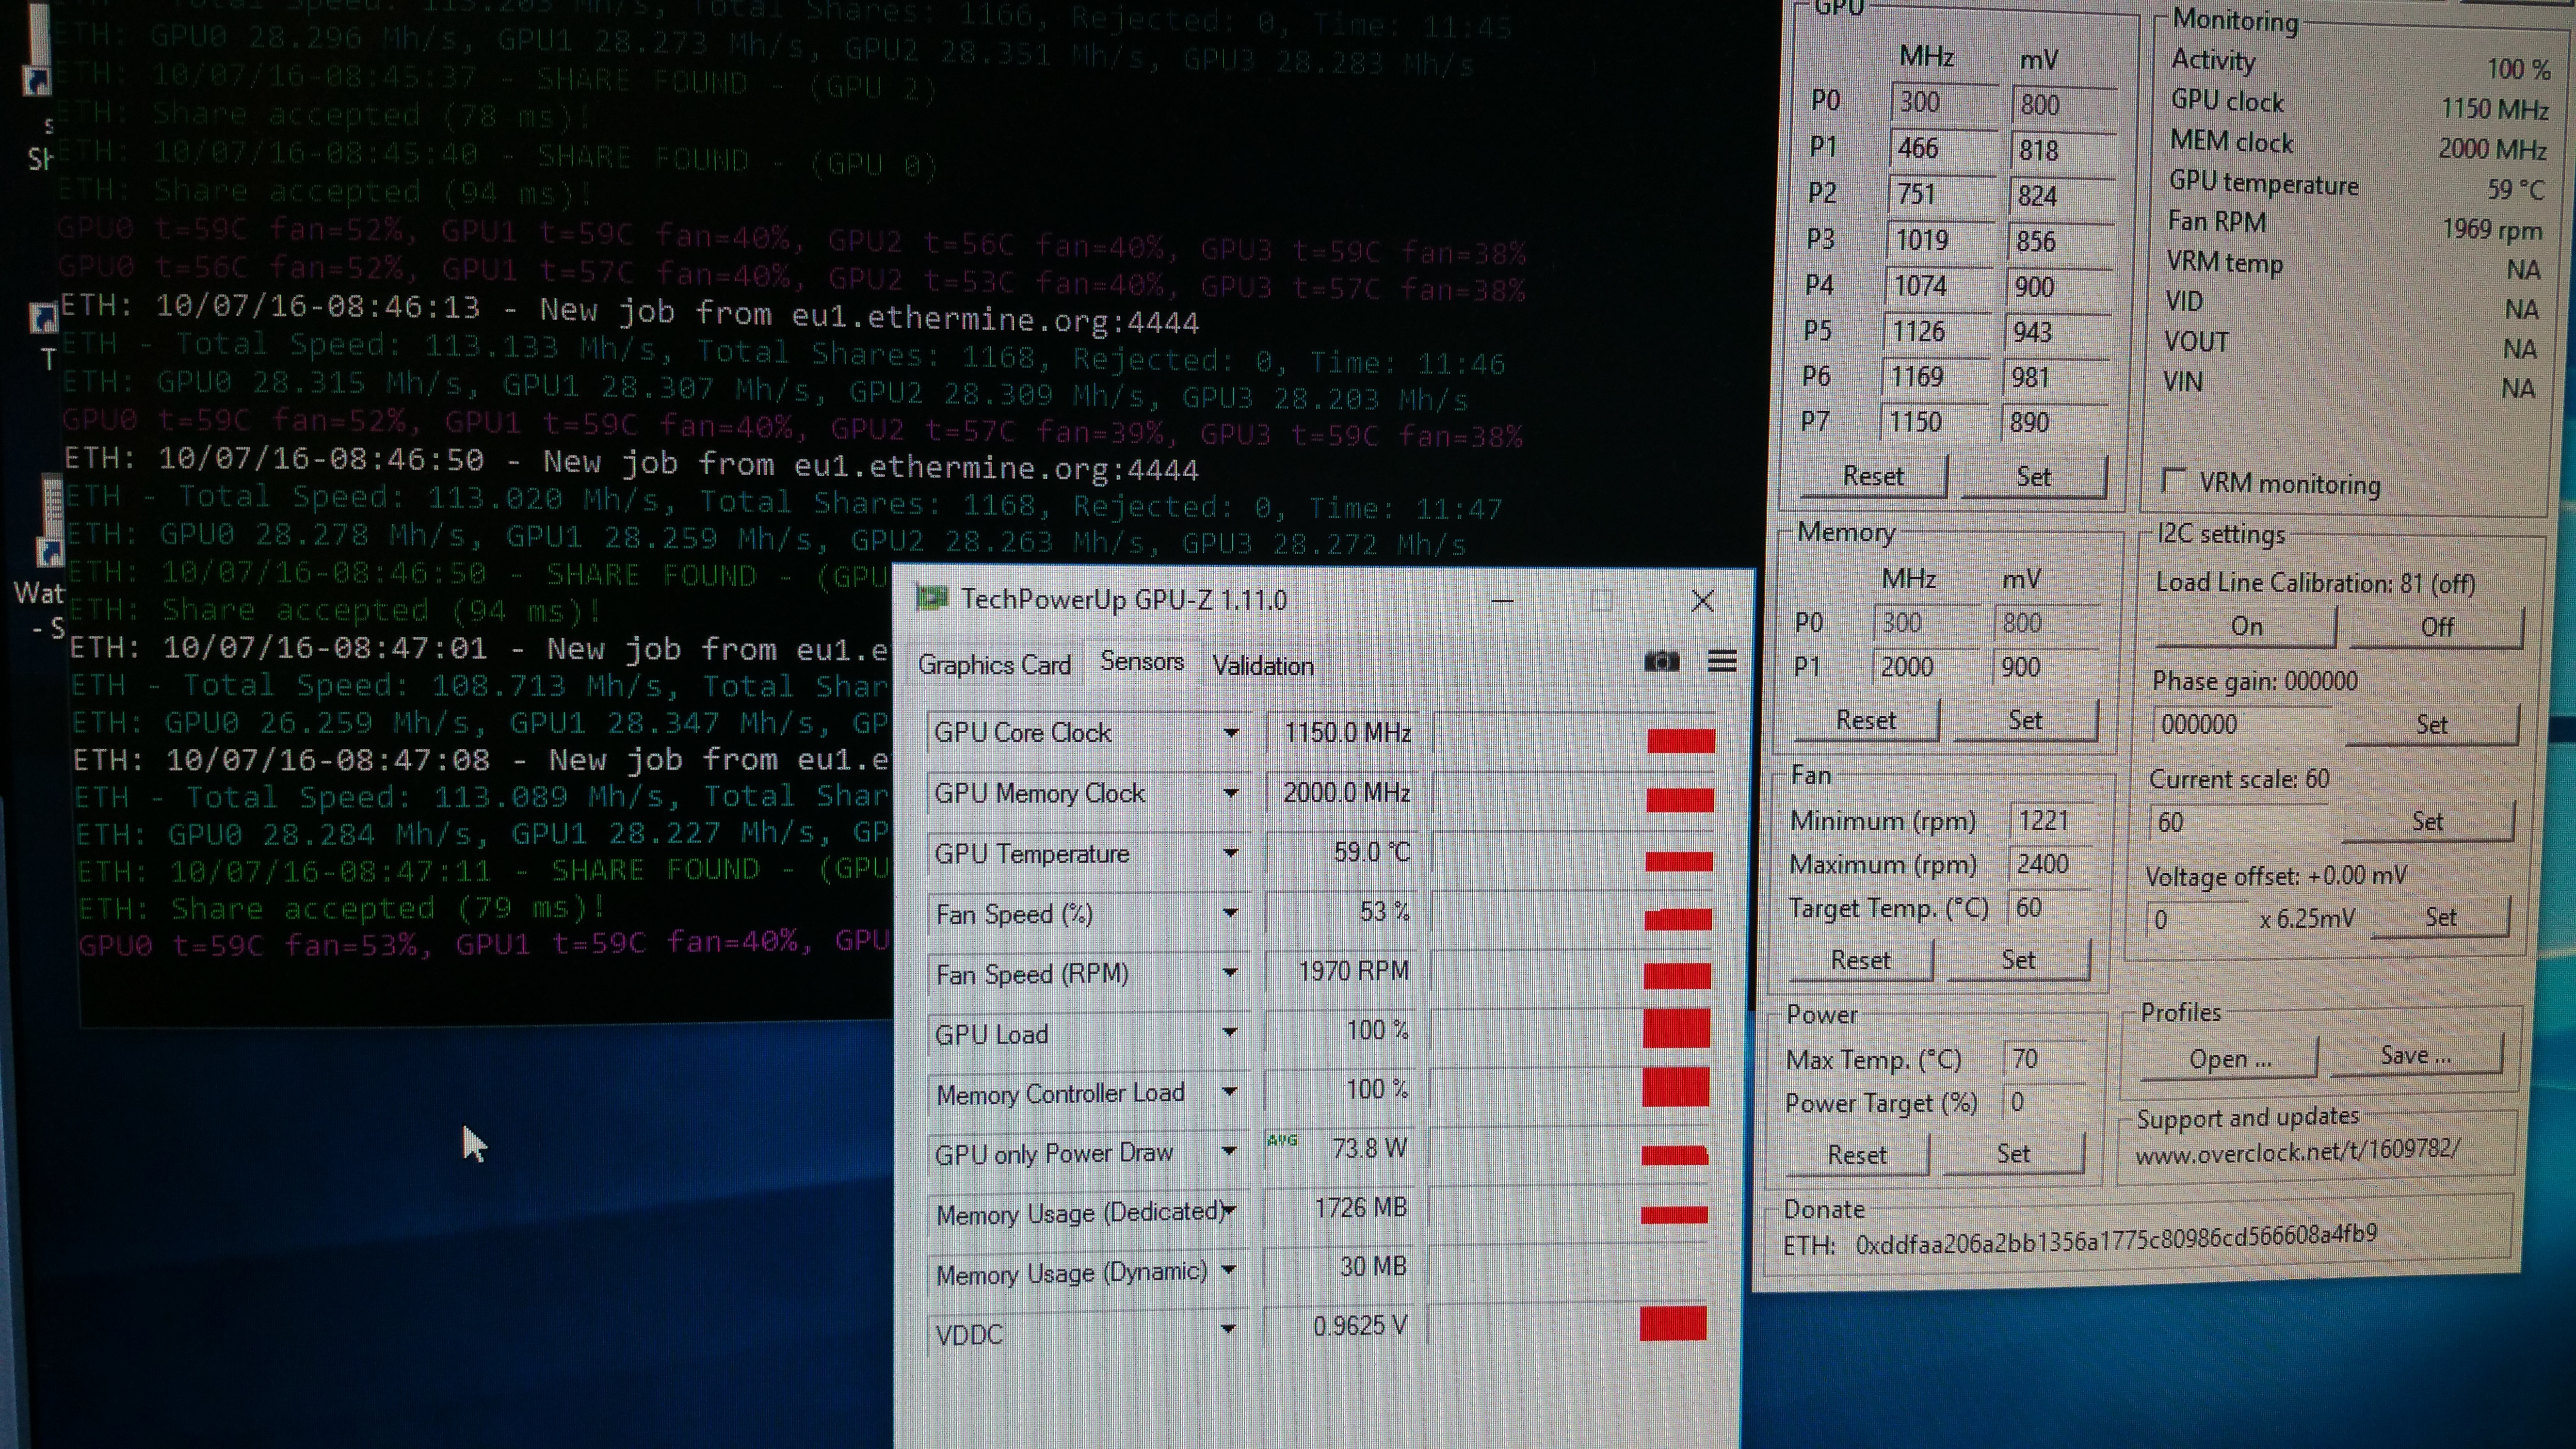 GIGABYTE Radeon™ RX 470 G1 Gaming, 4GB 28+MHS bios mod